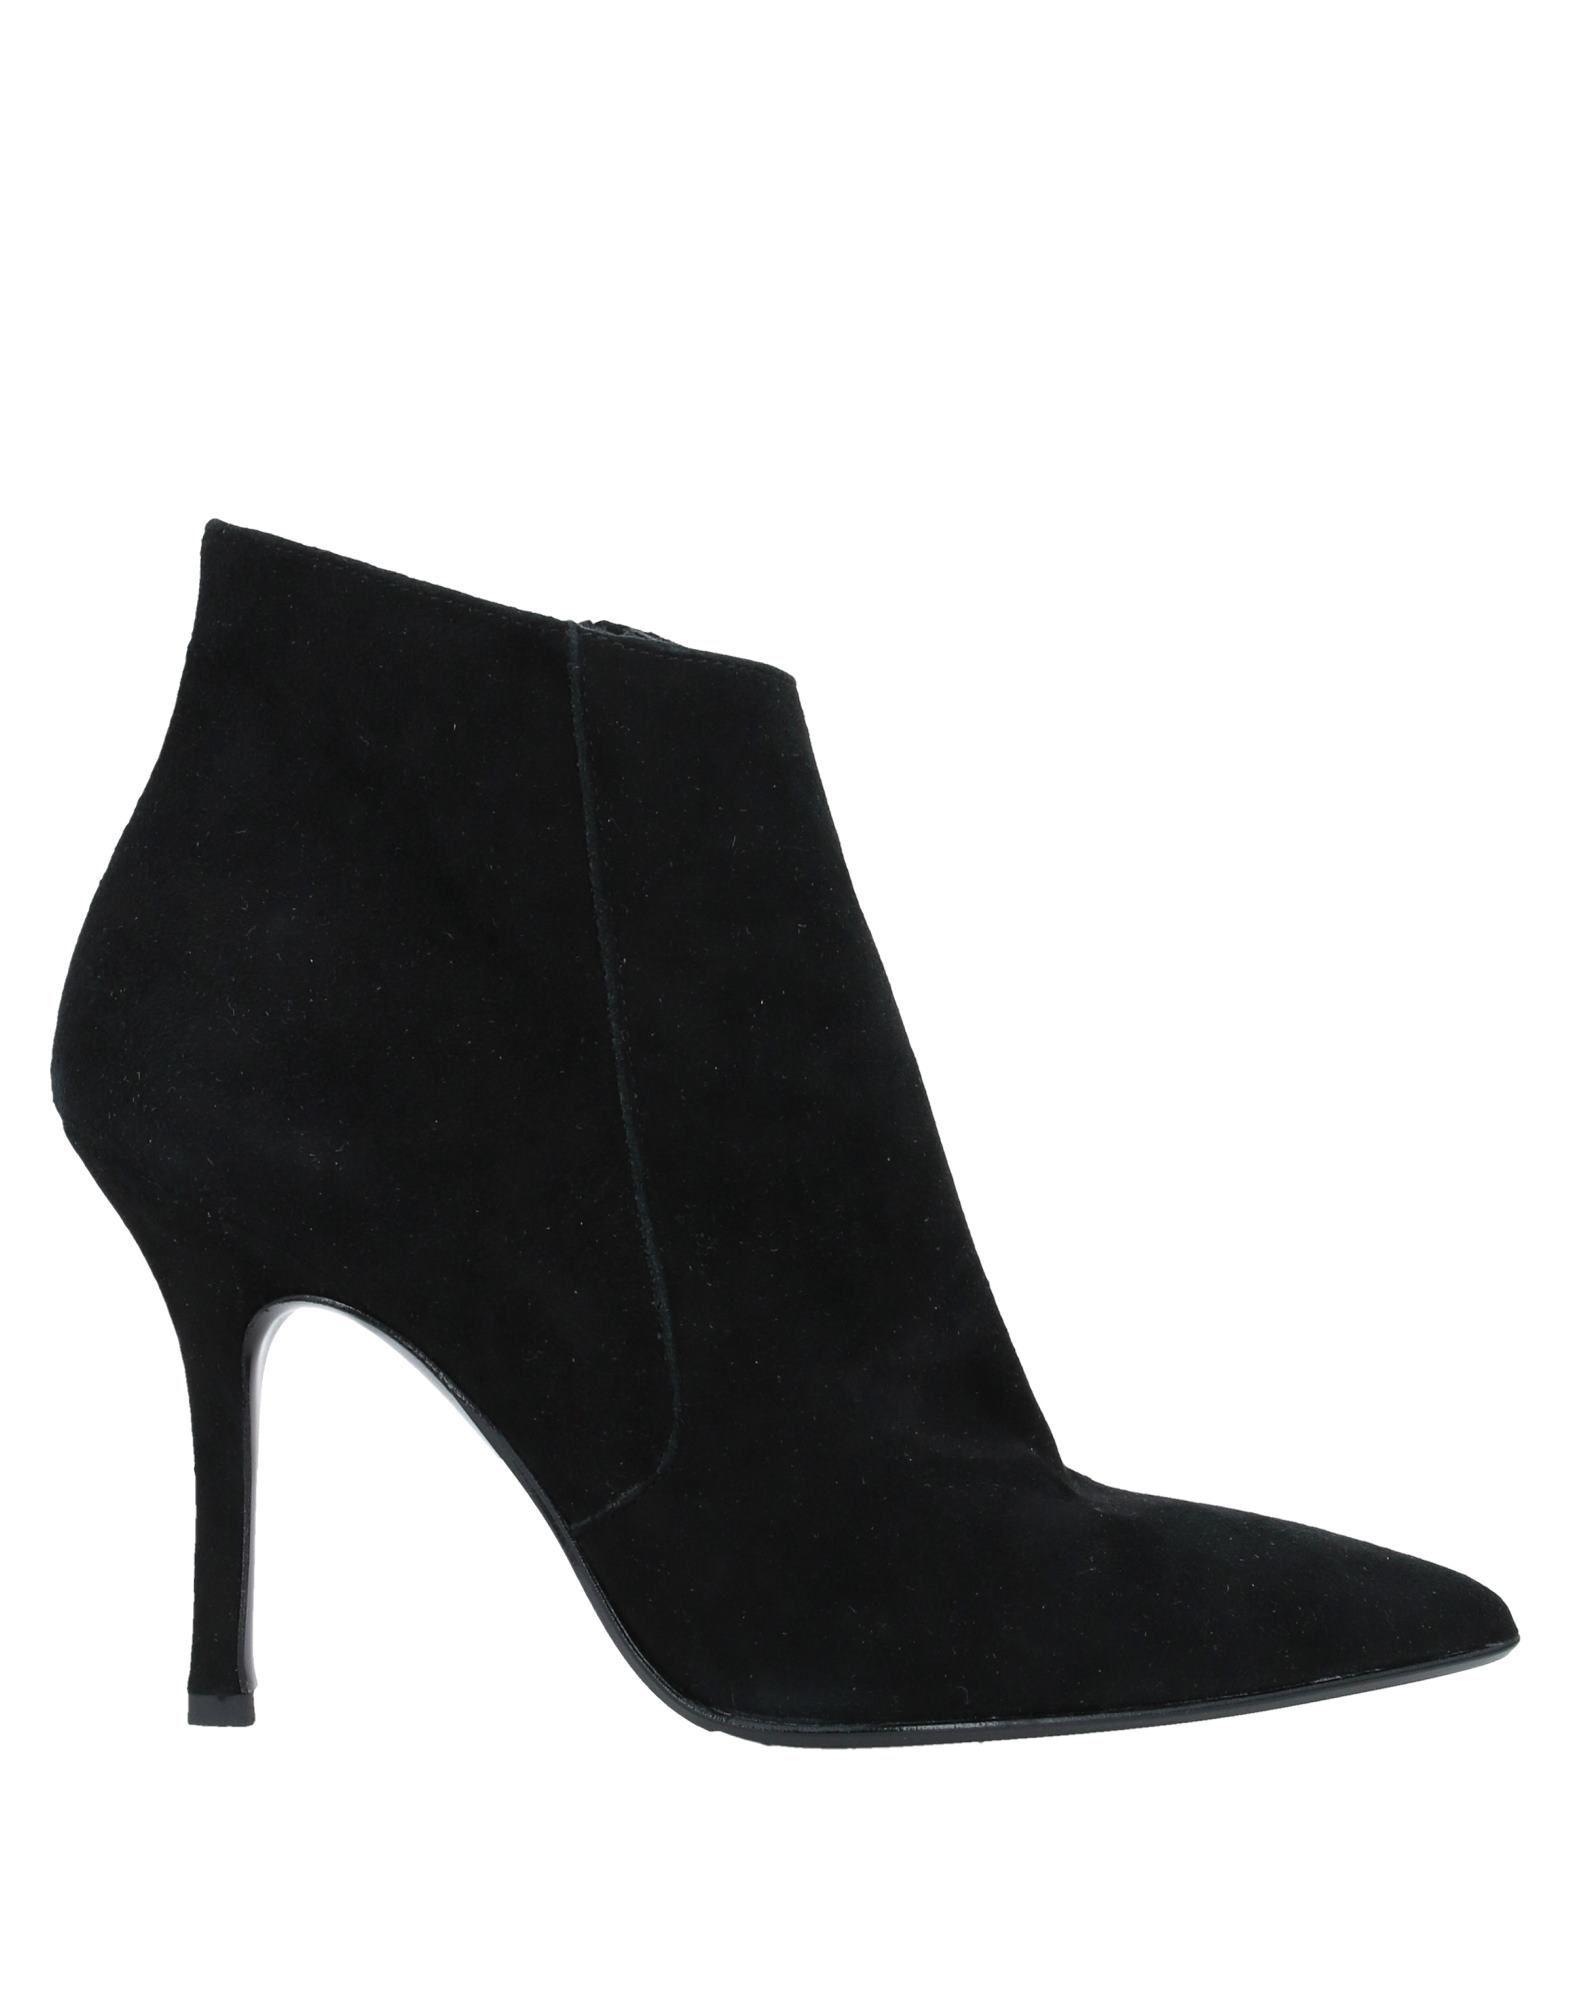 Bagatt Women's Ankle Boots Black Goat Skin